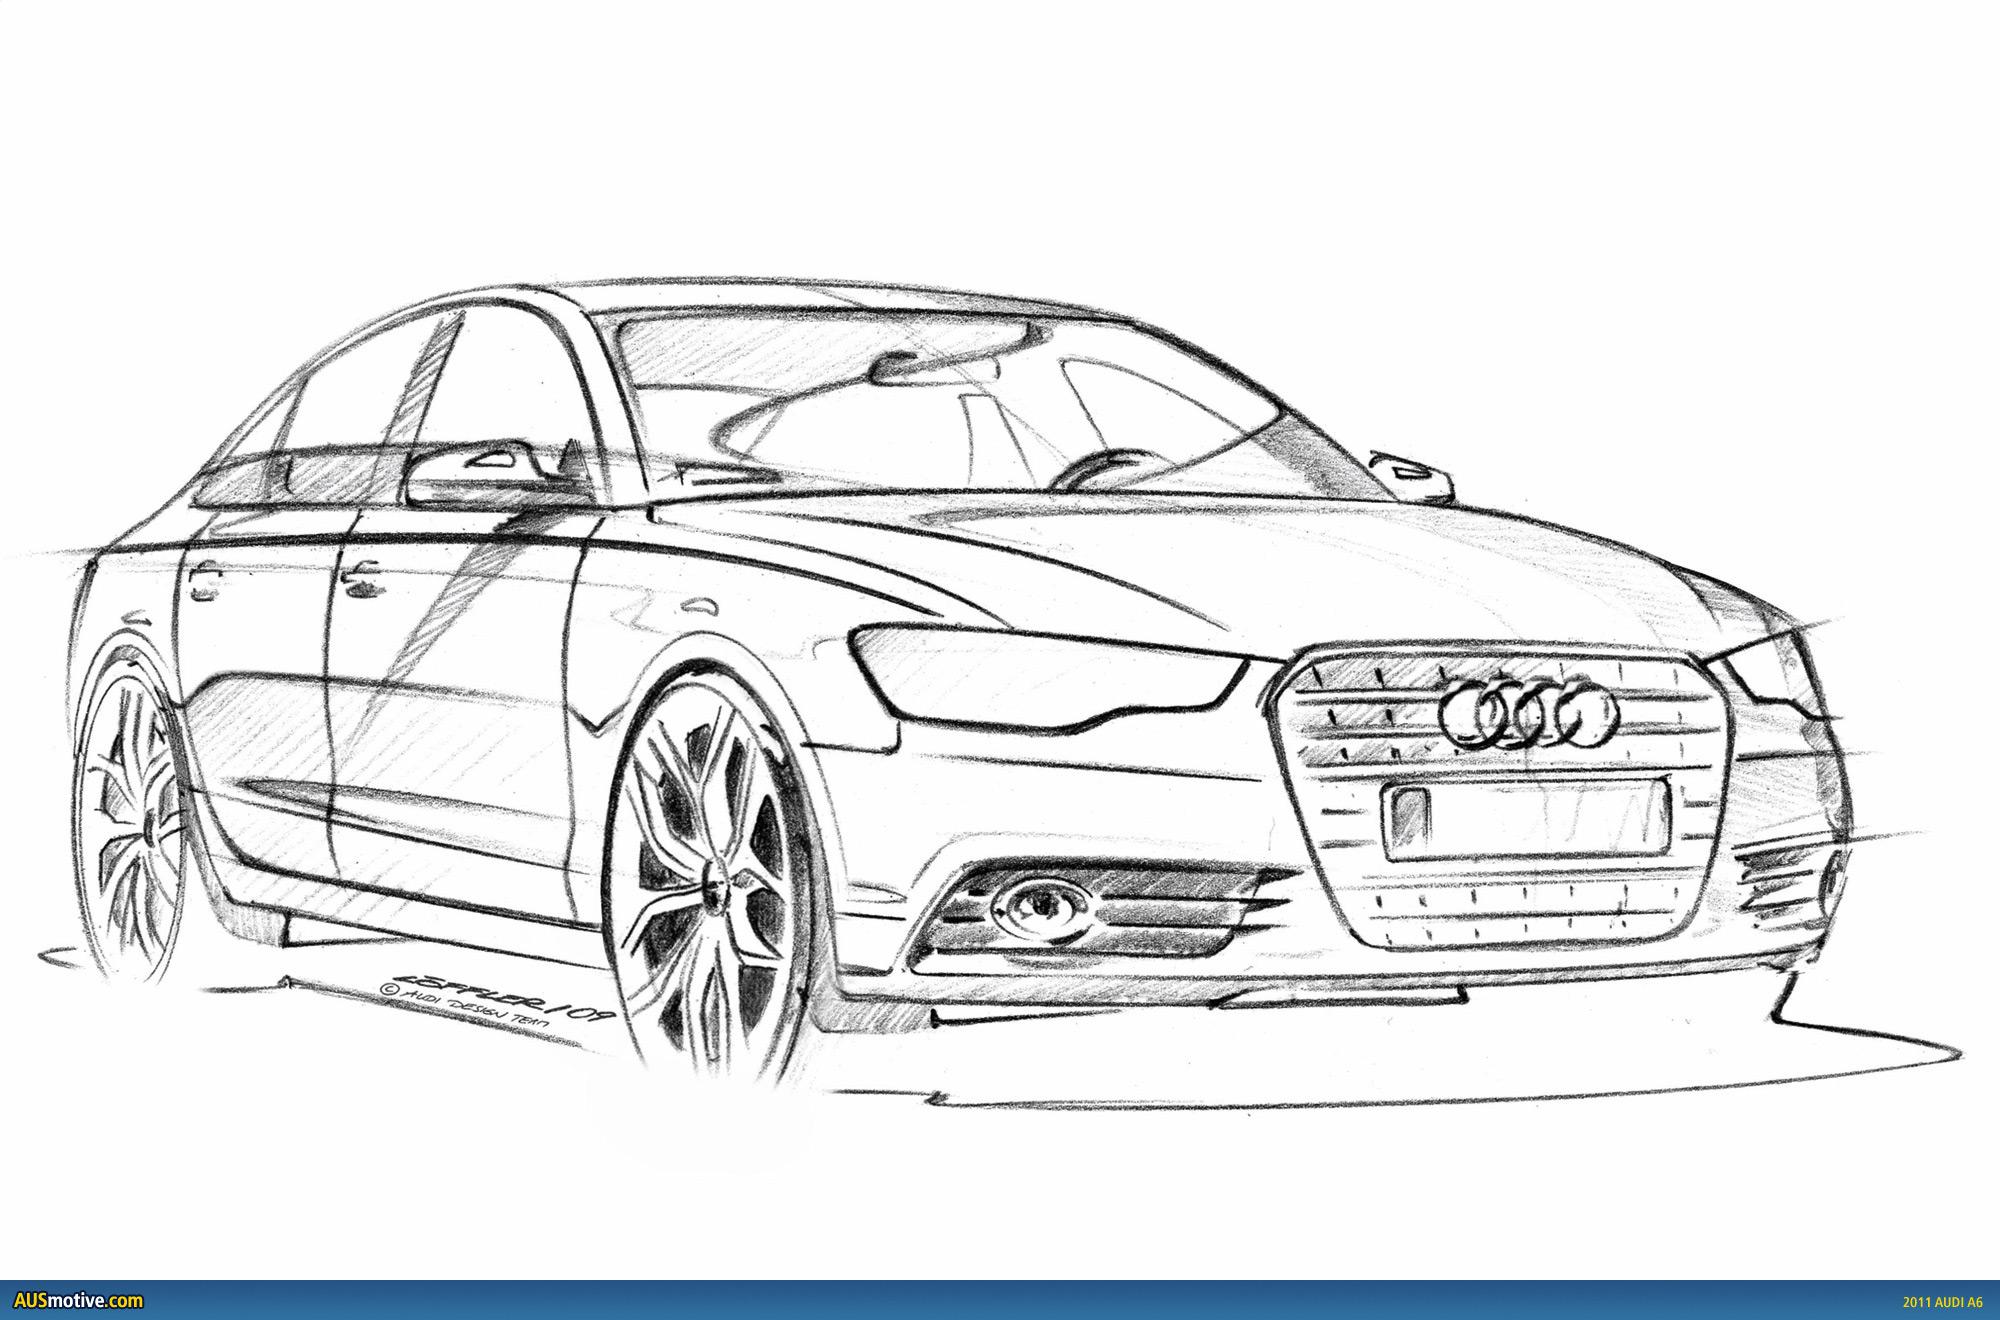 AUSmotive.com » 2011 Audi A6